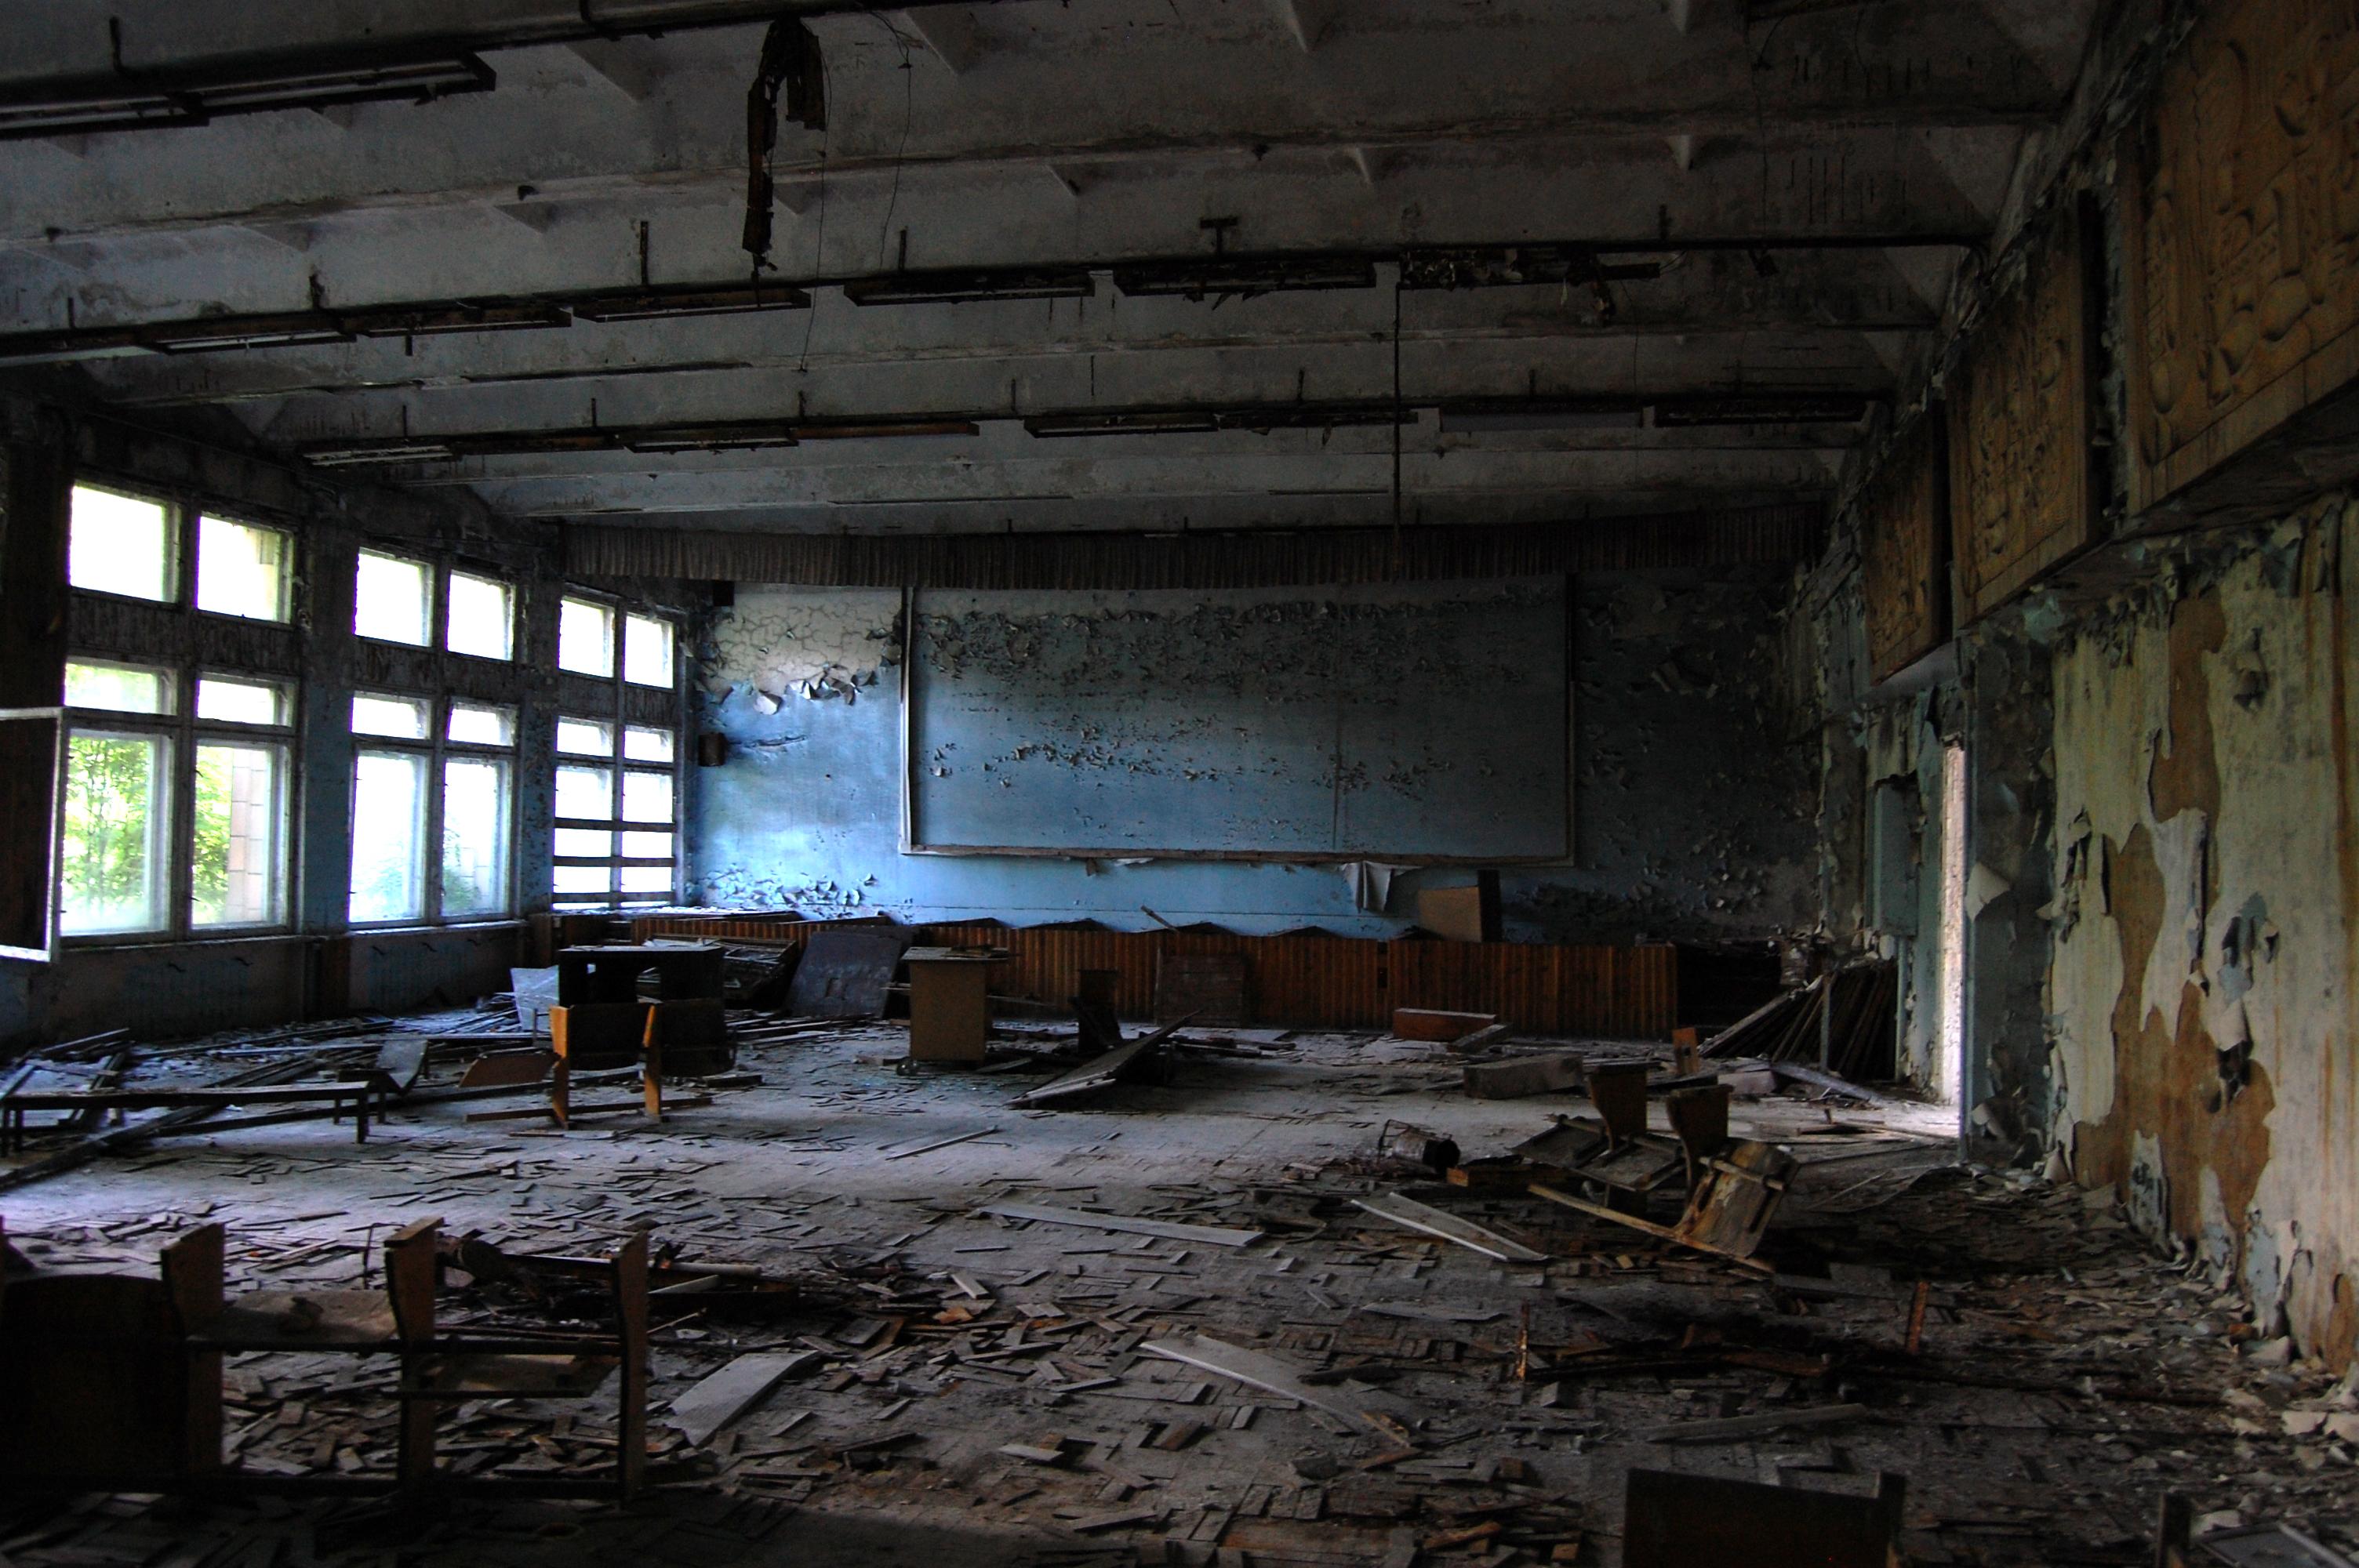 Pripyat Wallpapers High Quality | Download Free